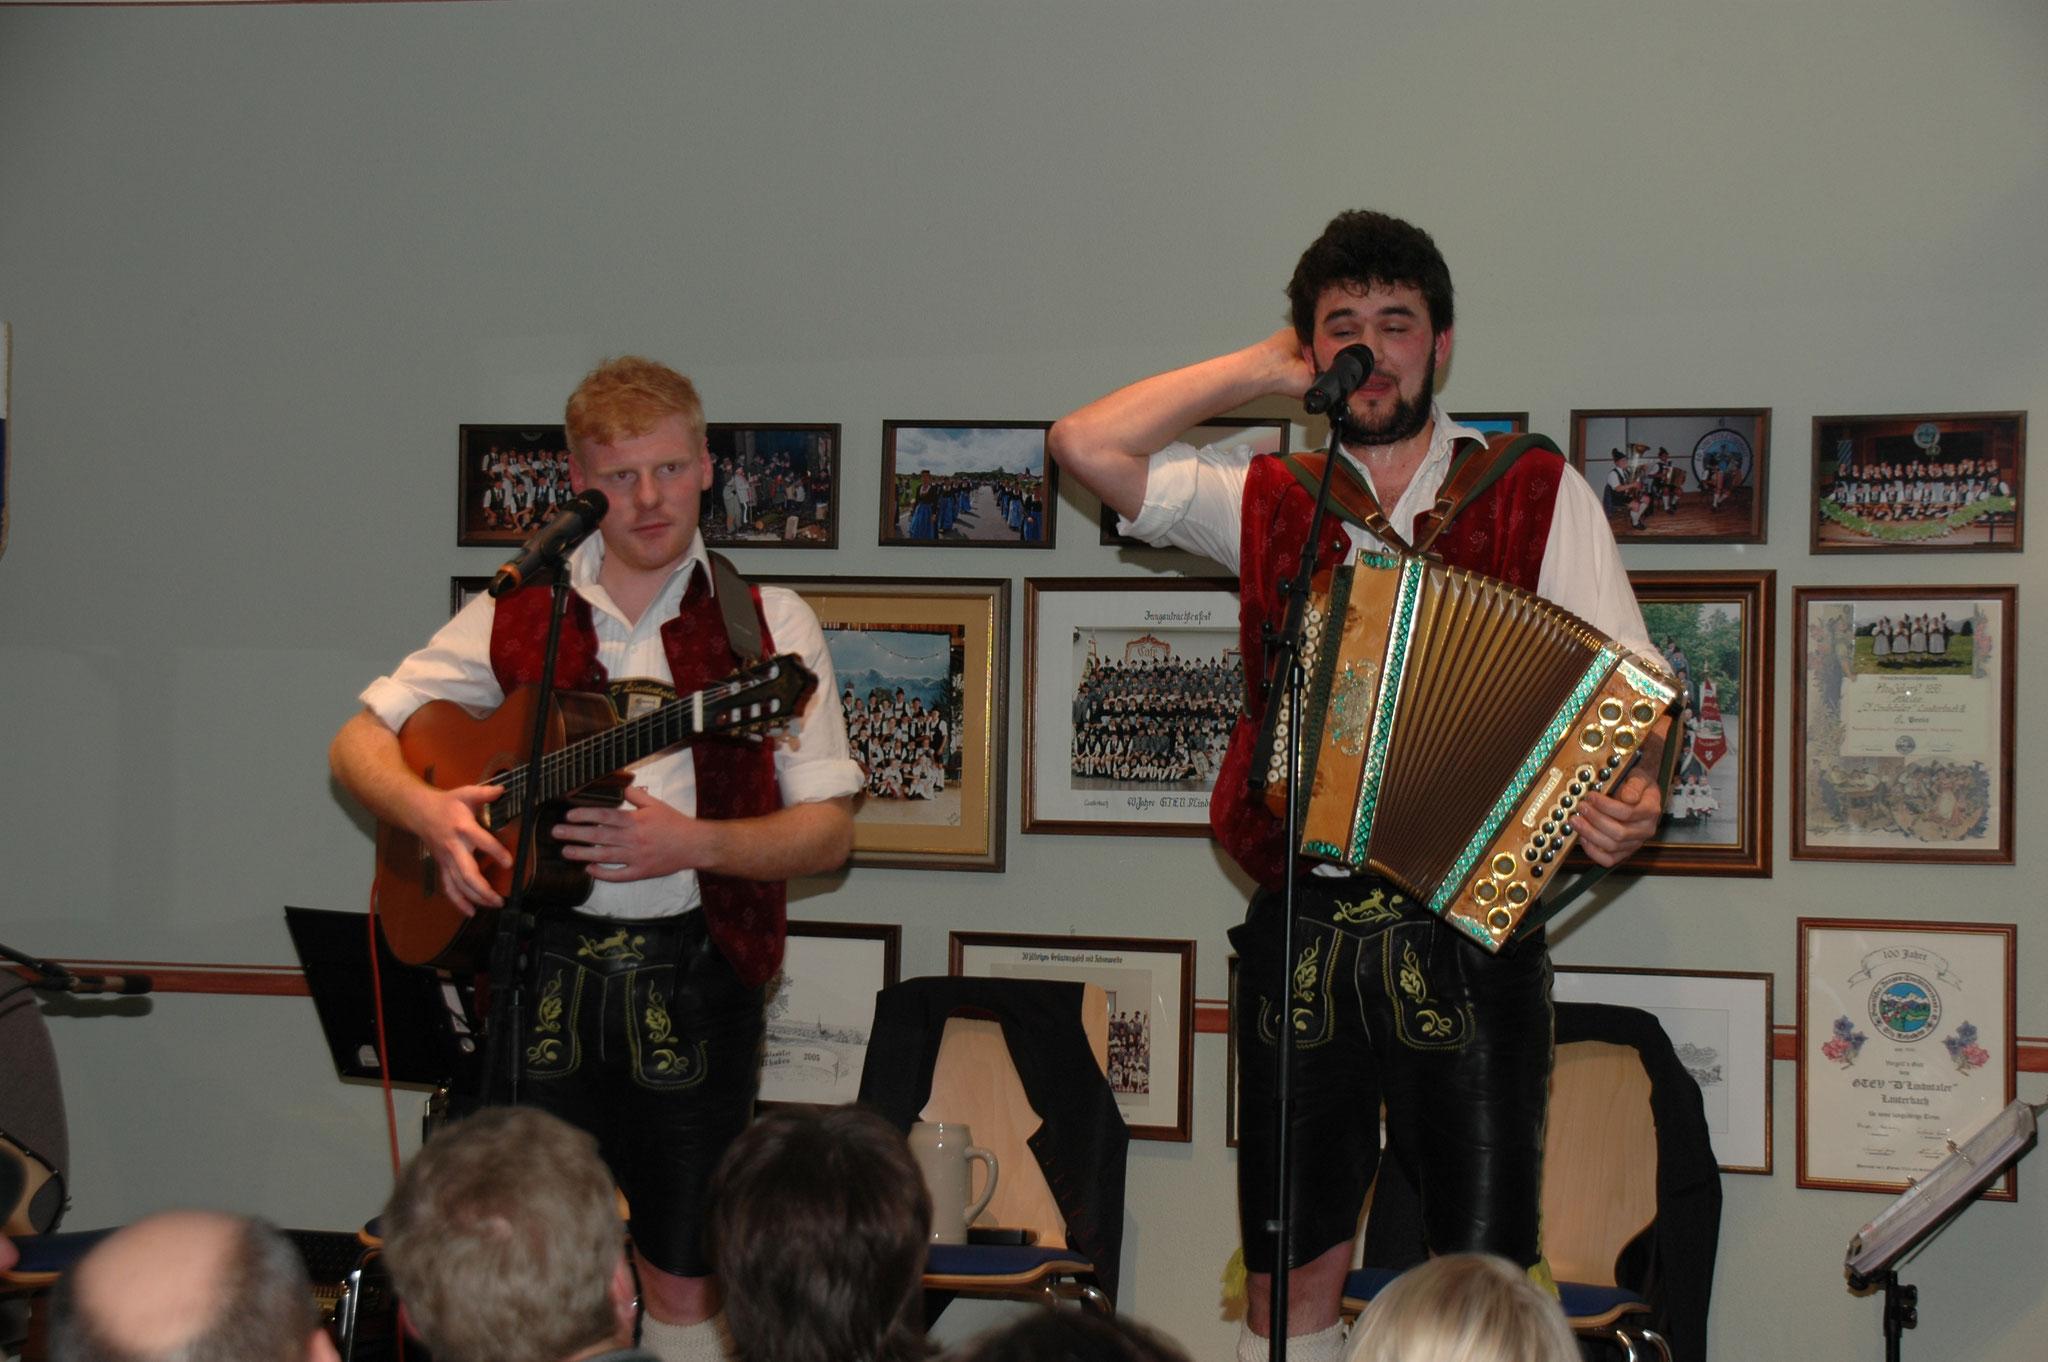 Starkbierfest Lauterbach Trachtenverein D'Lindntaler De Laddshosen